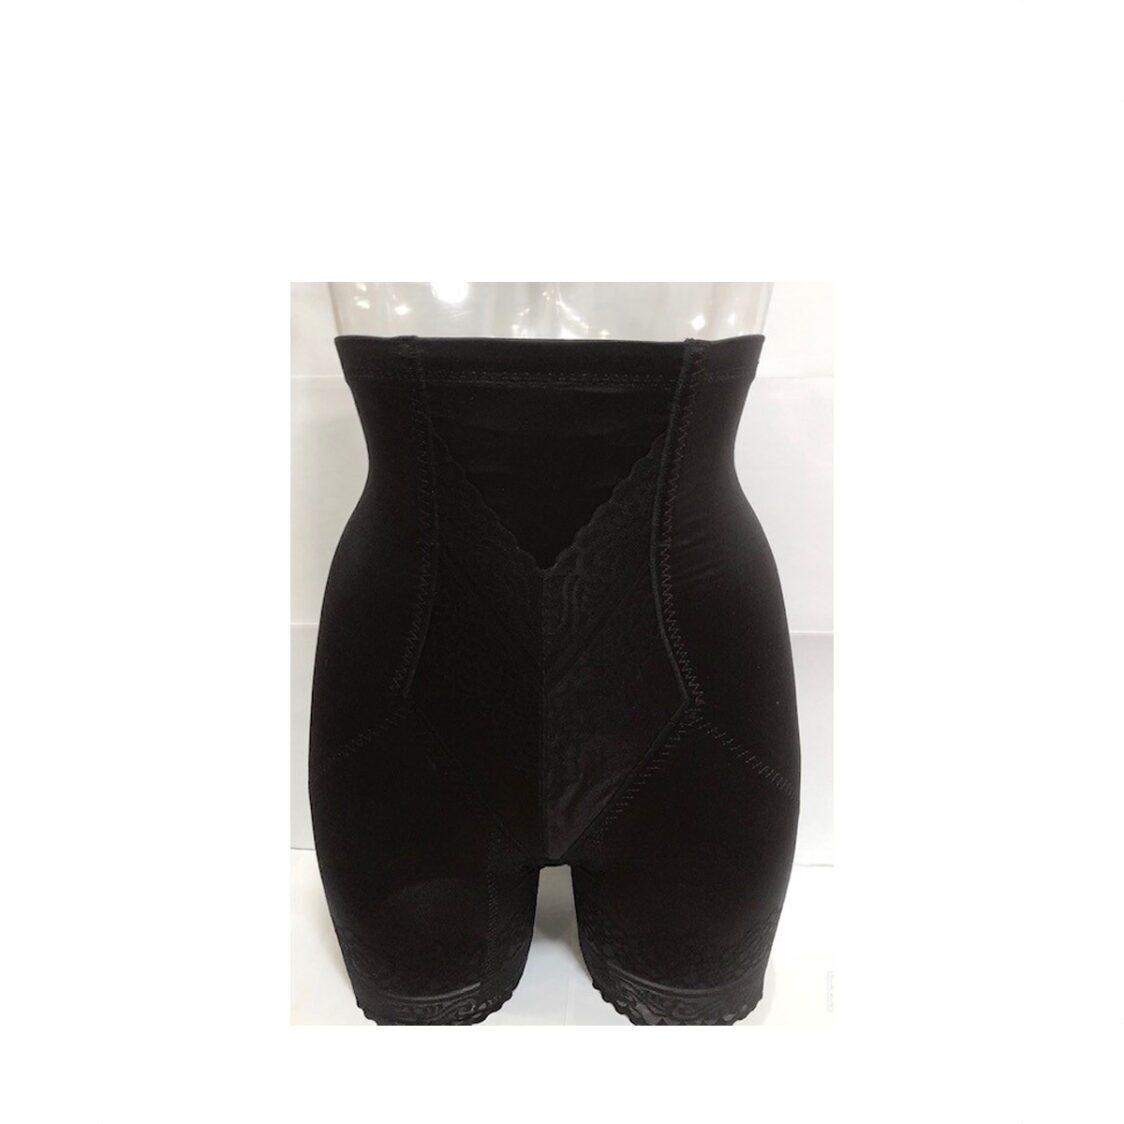 Sharefun High-Waist Long Leg Girdle Black